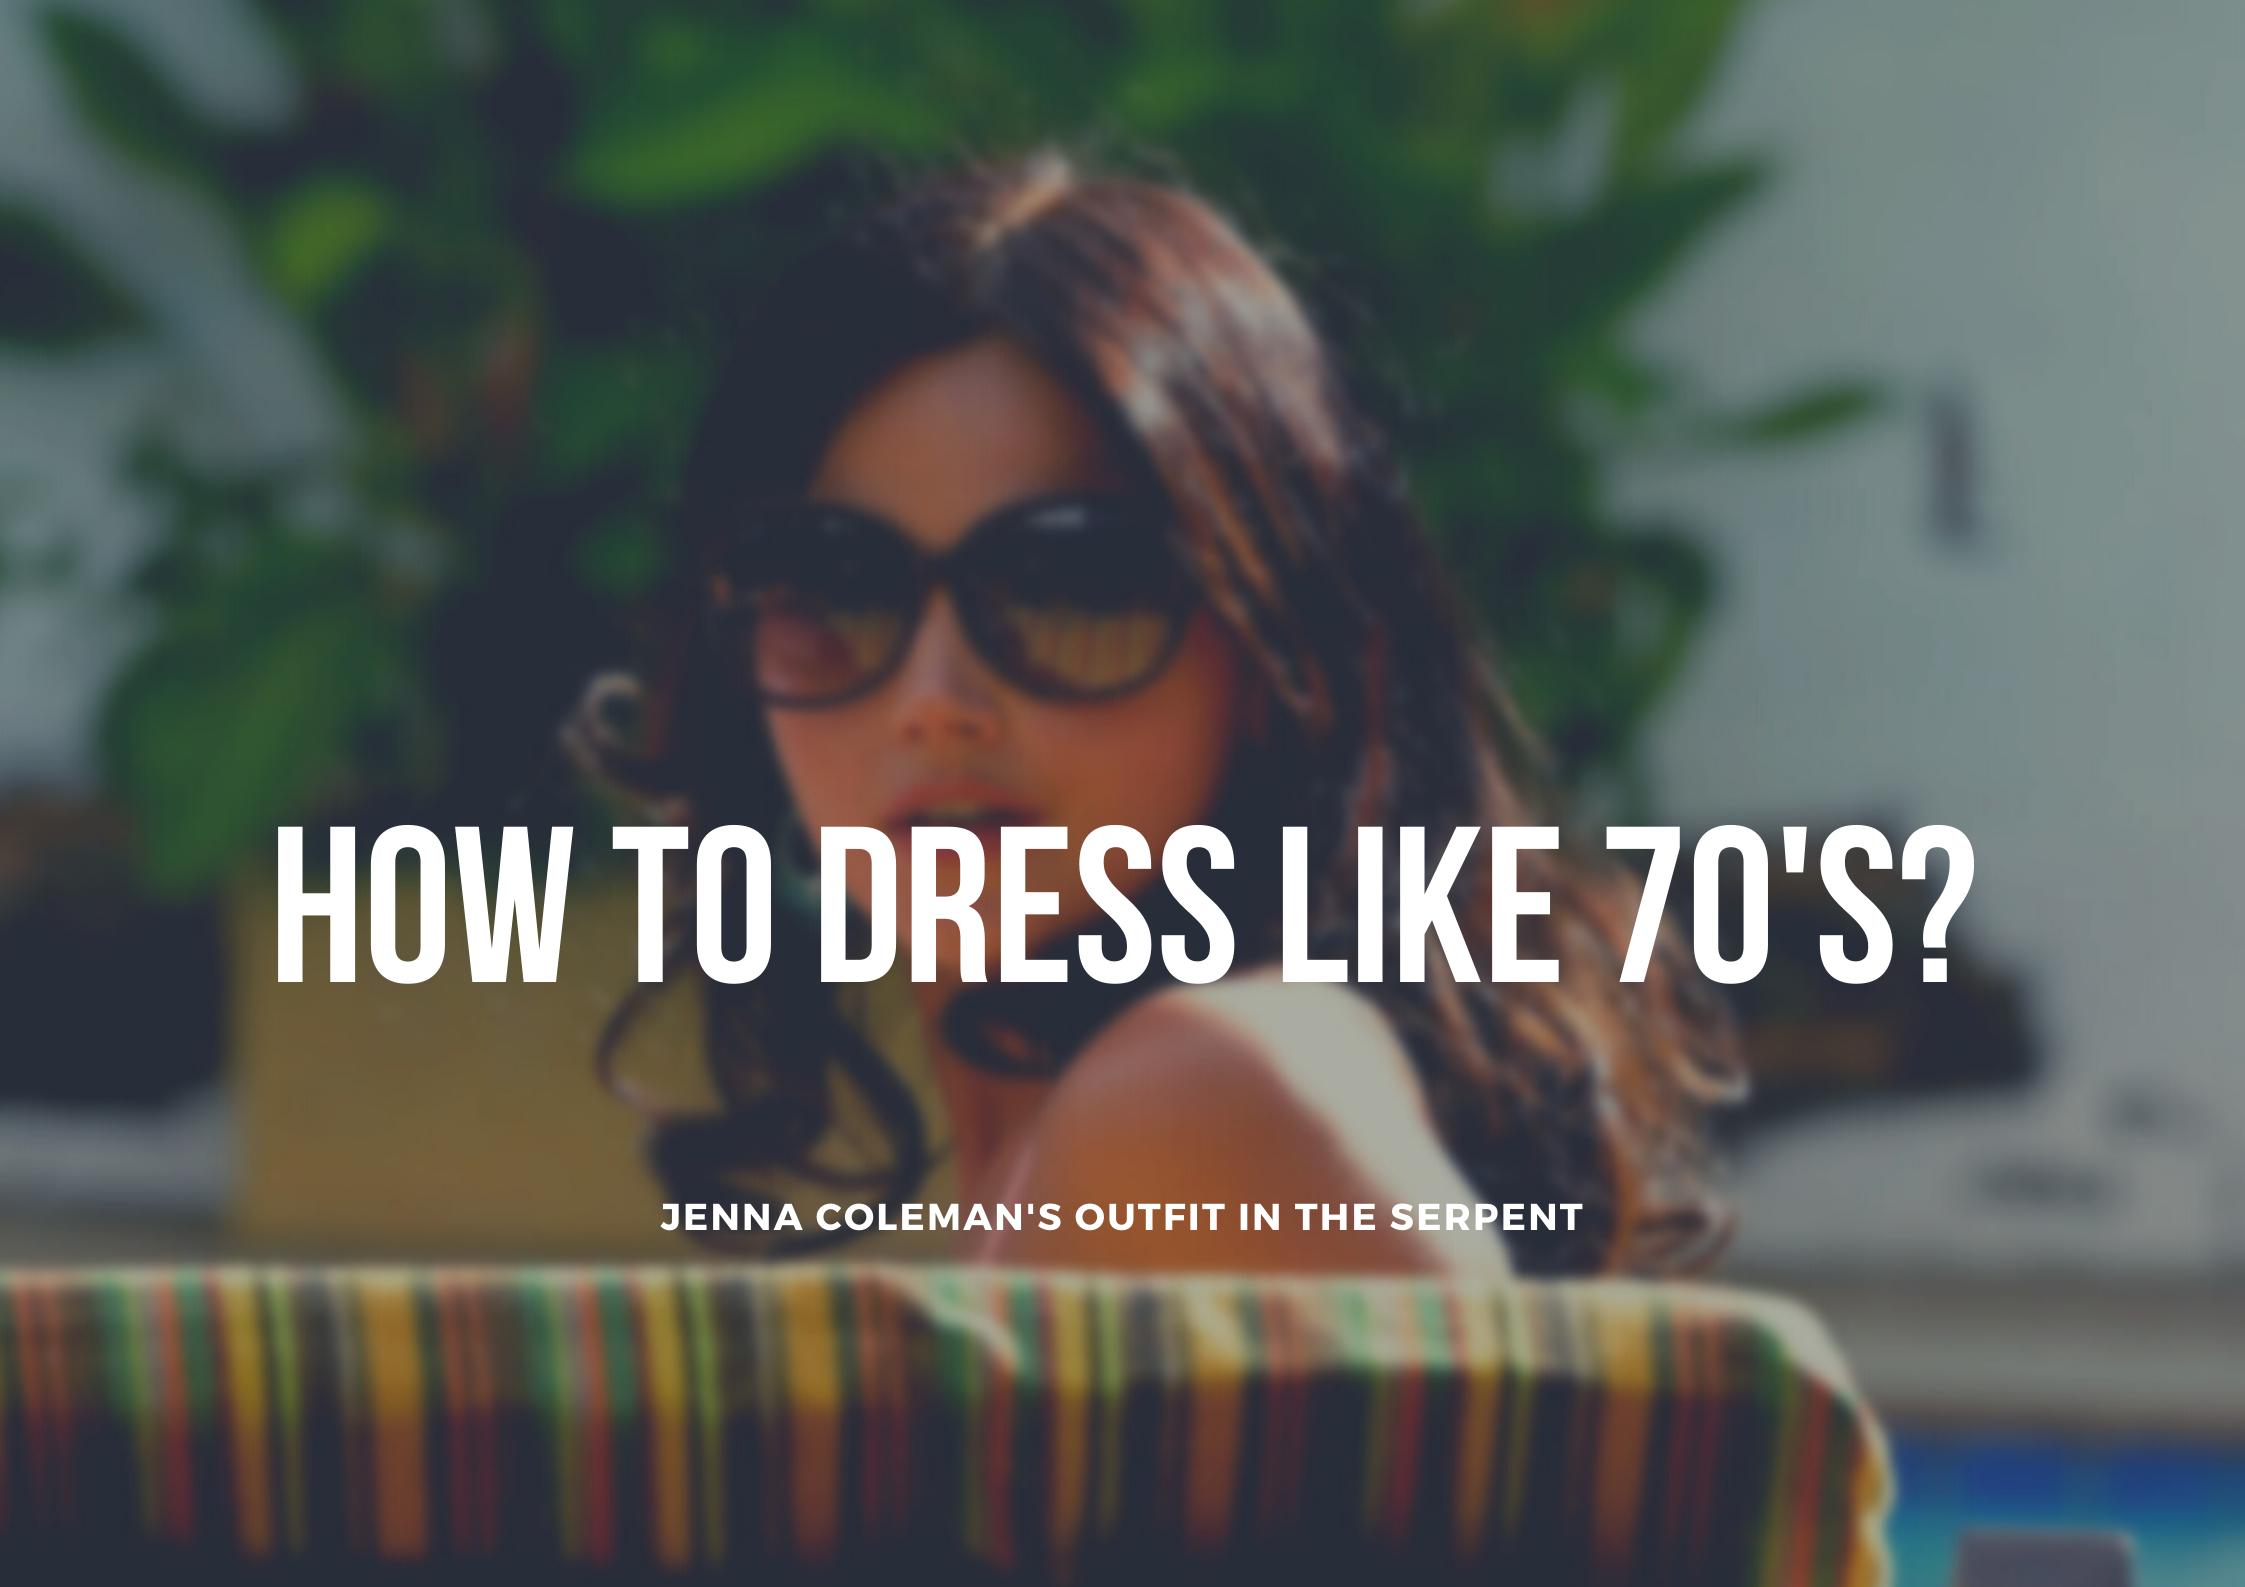 Netflix影集【The Serpent 蛇惑】1970年代穿搭單品分享!How to dress like Jenna Coleman in the serpent?